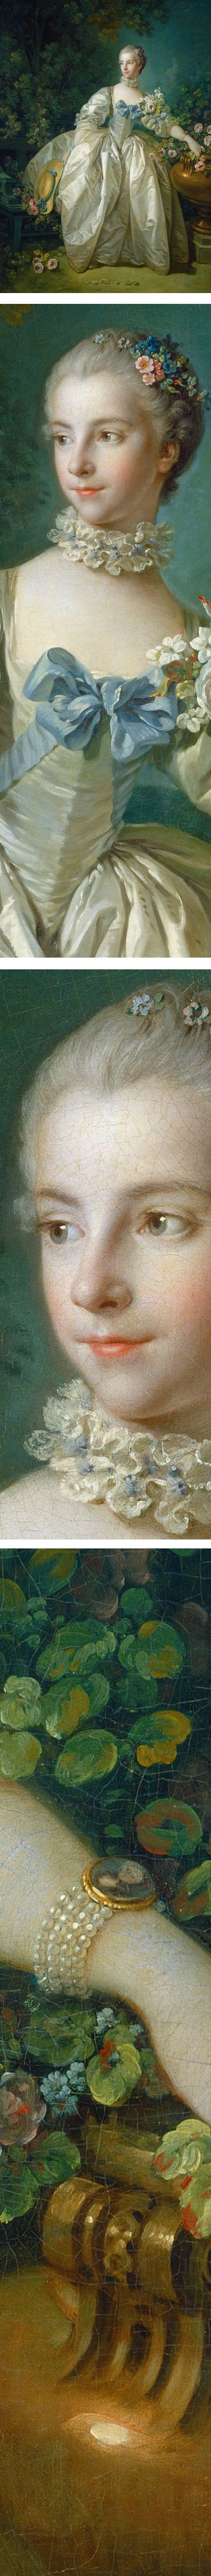 Madame Bergeret, Francois Boucher: